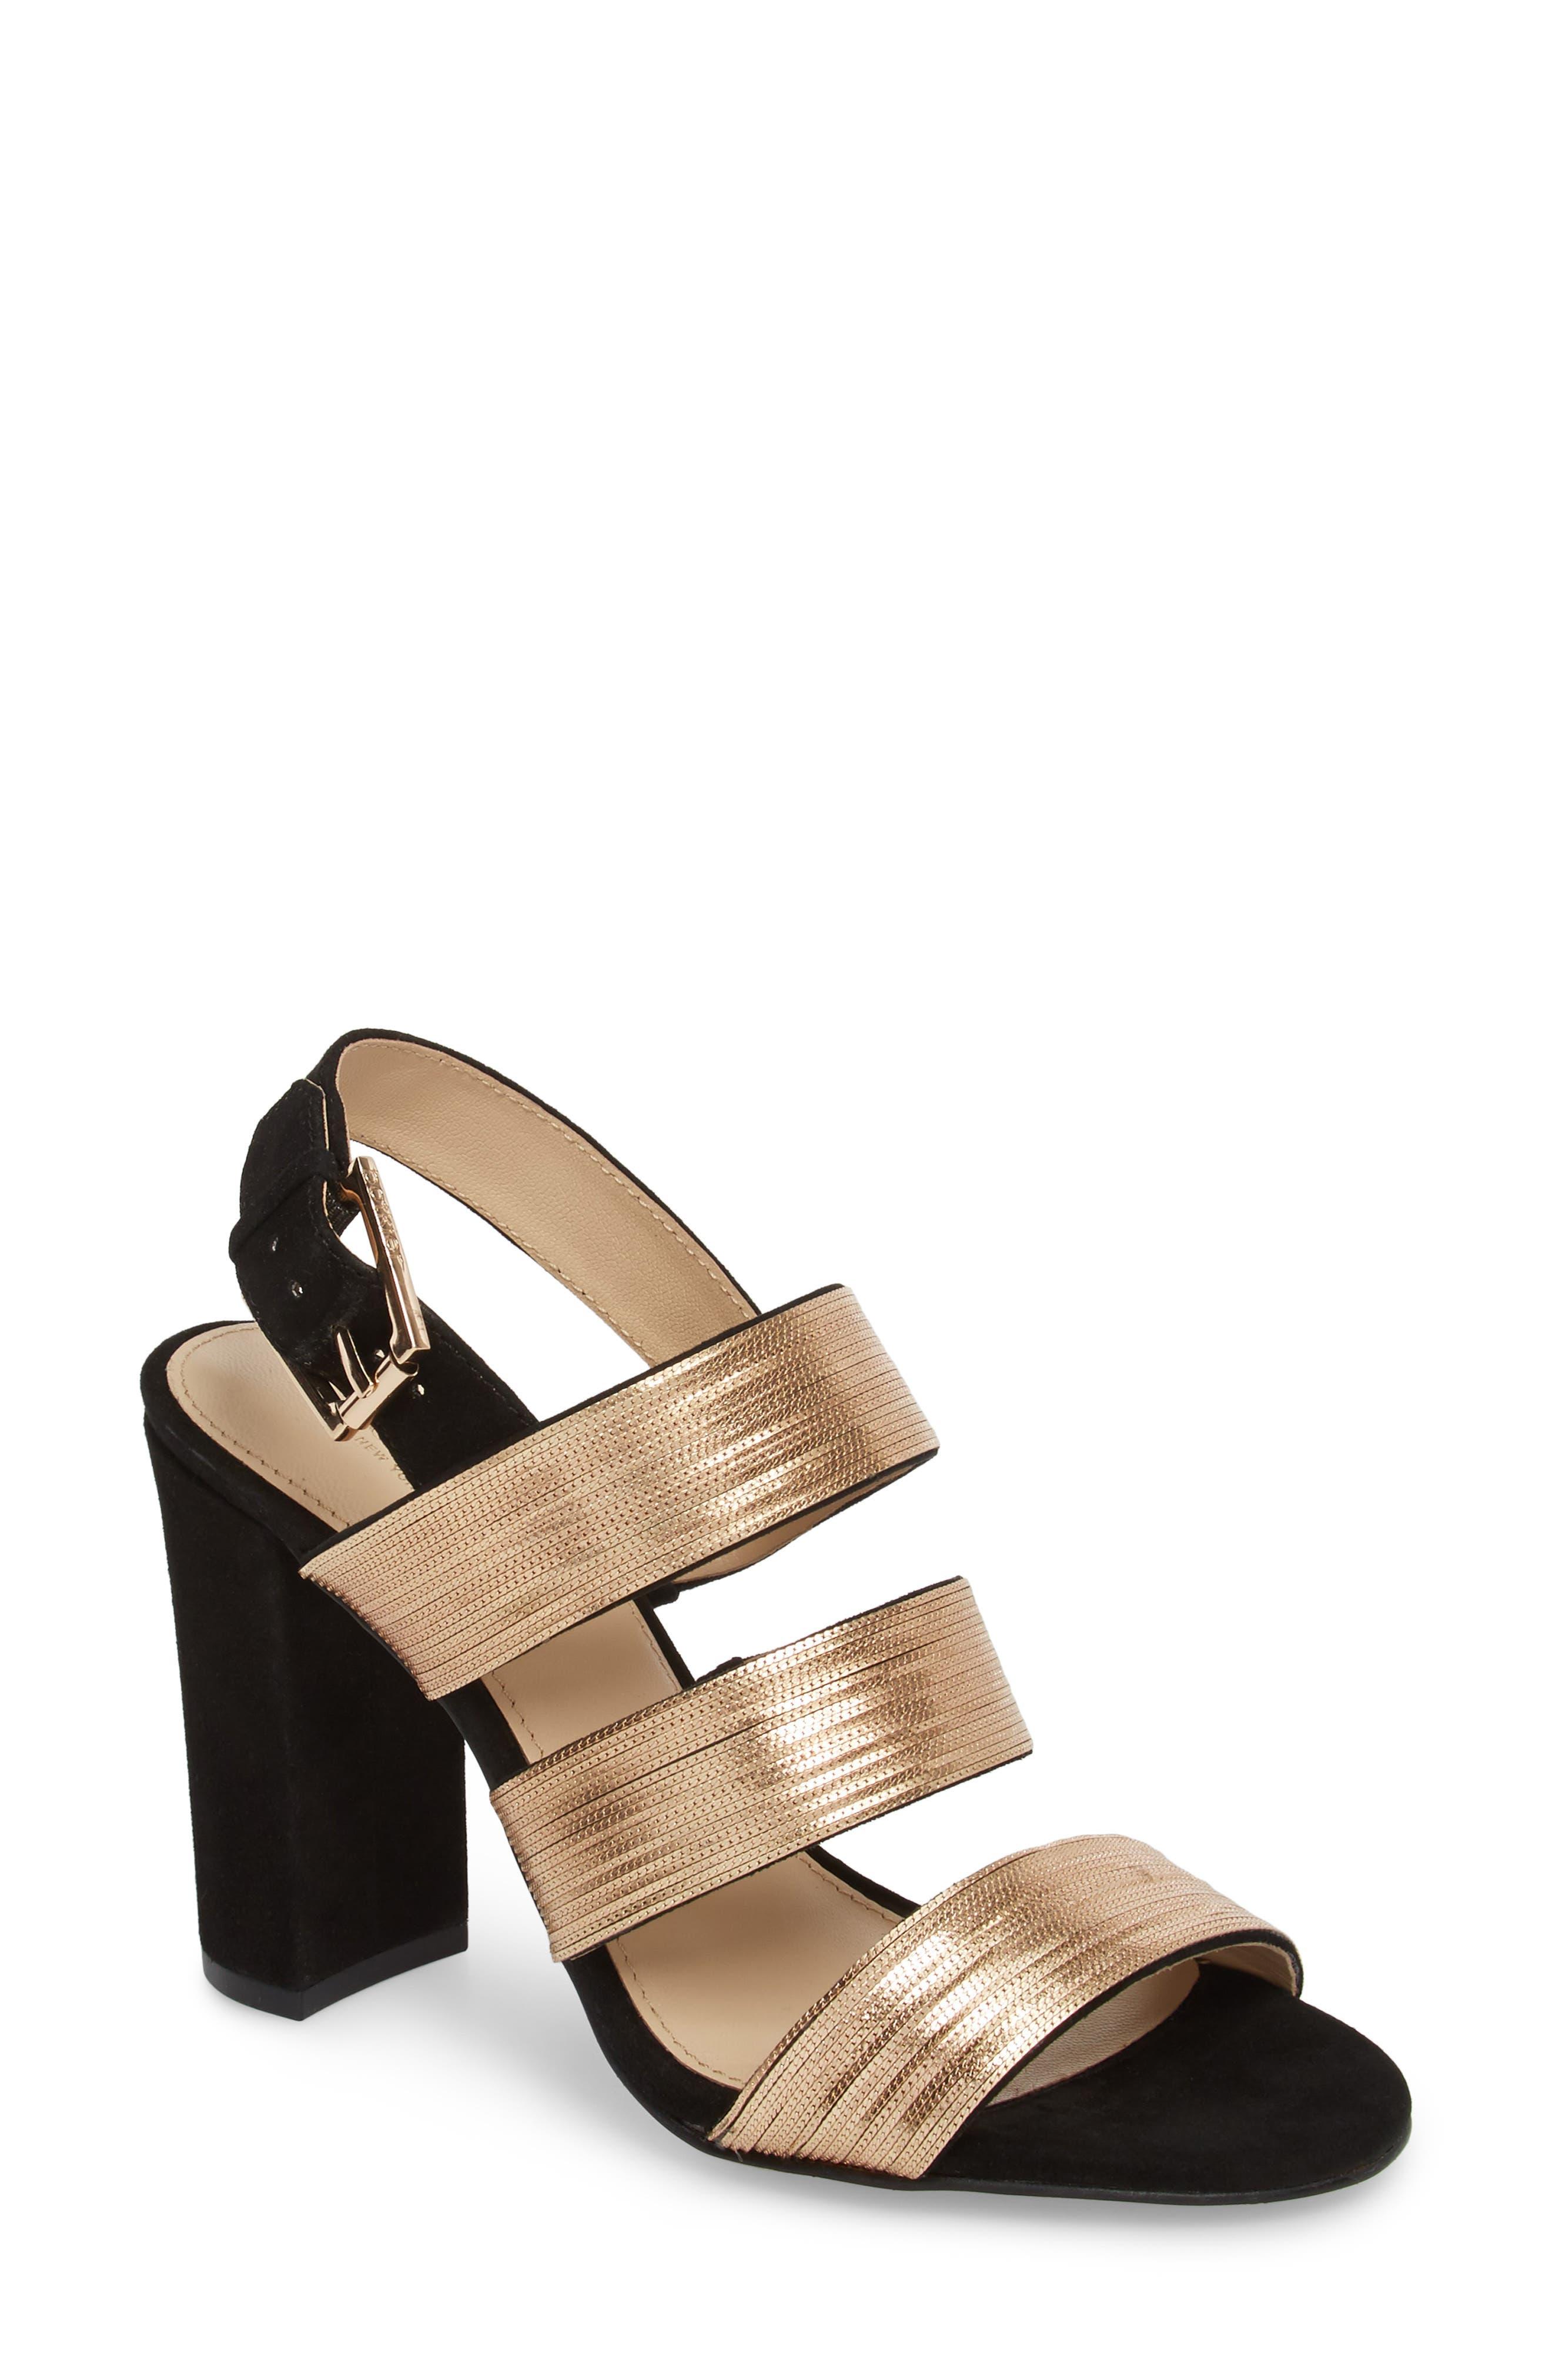 Genesa Chain Slingback Sandal,                         Main,                         color, Black/ Gold Suede